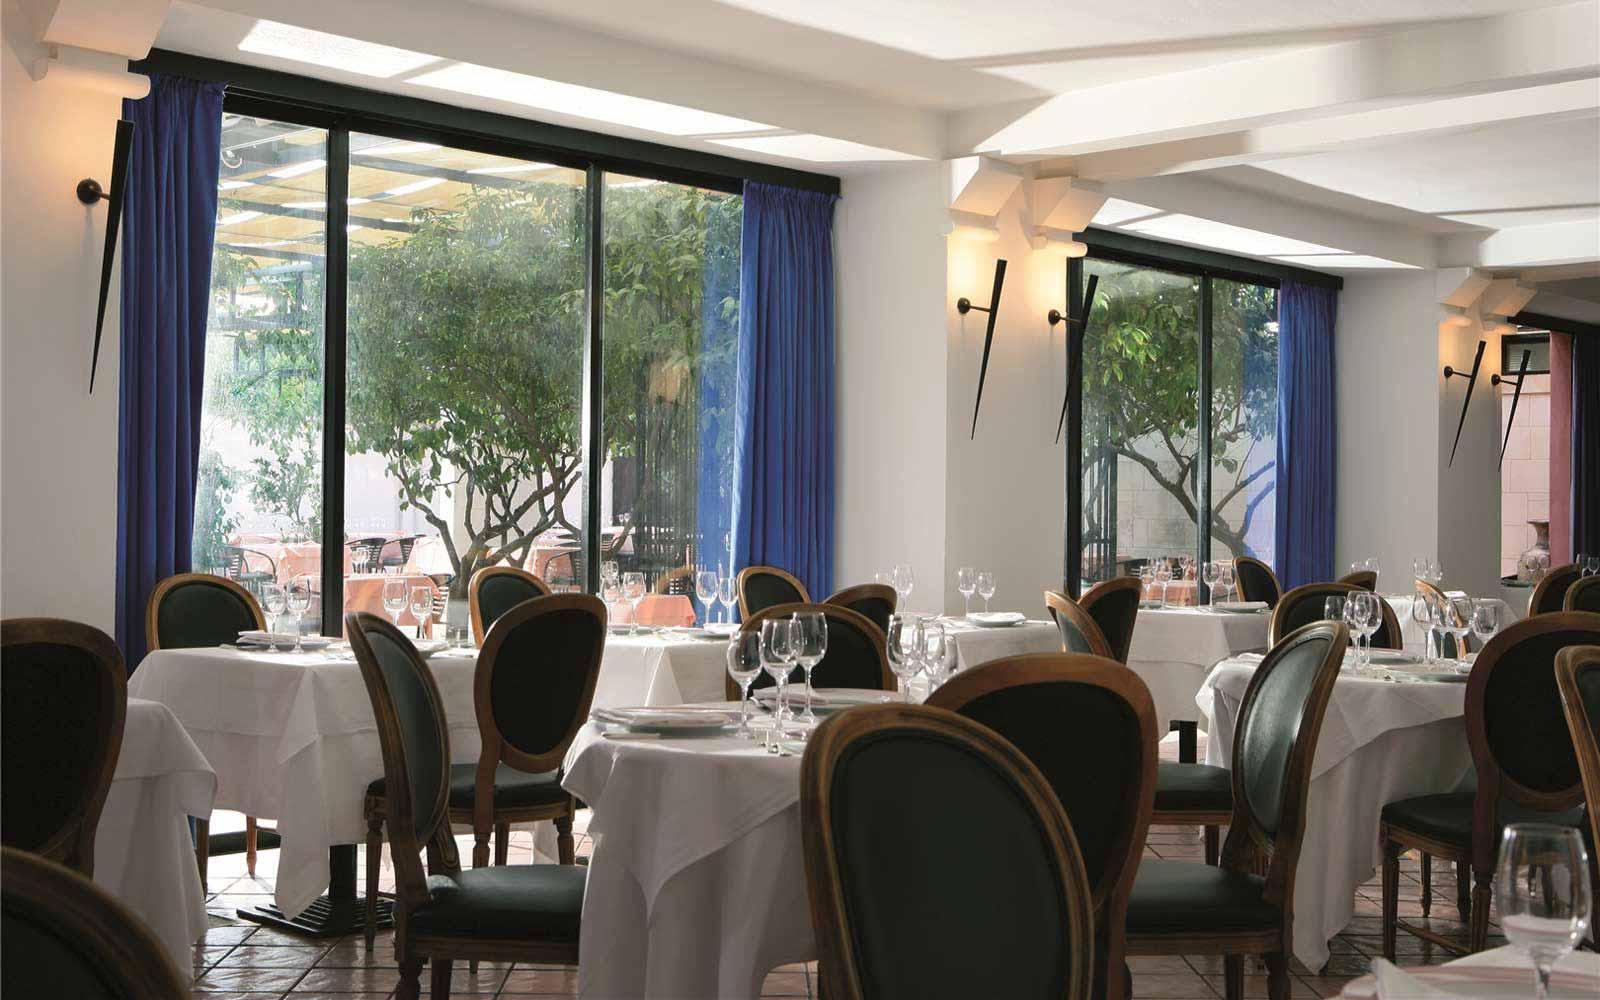 Restaurant at the Grand Hotel Masseria Santa Lucia